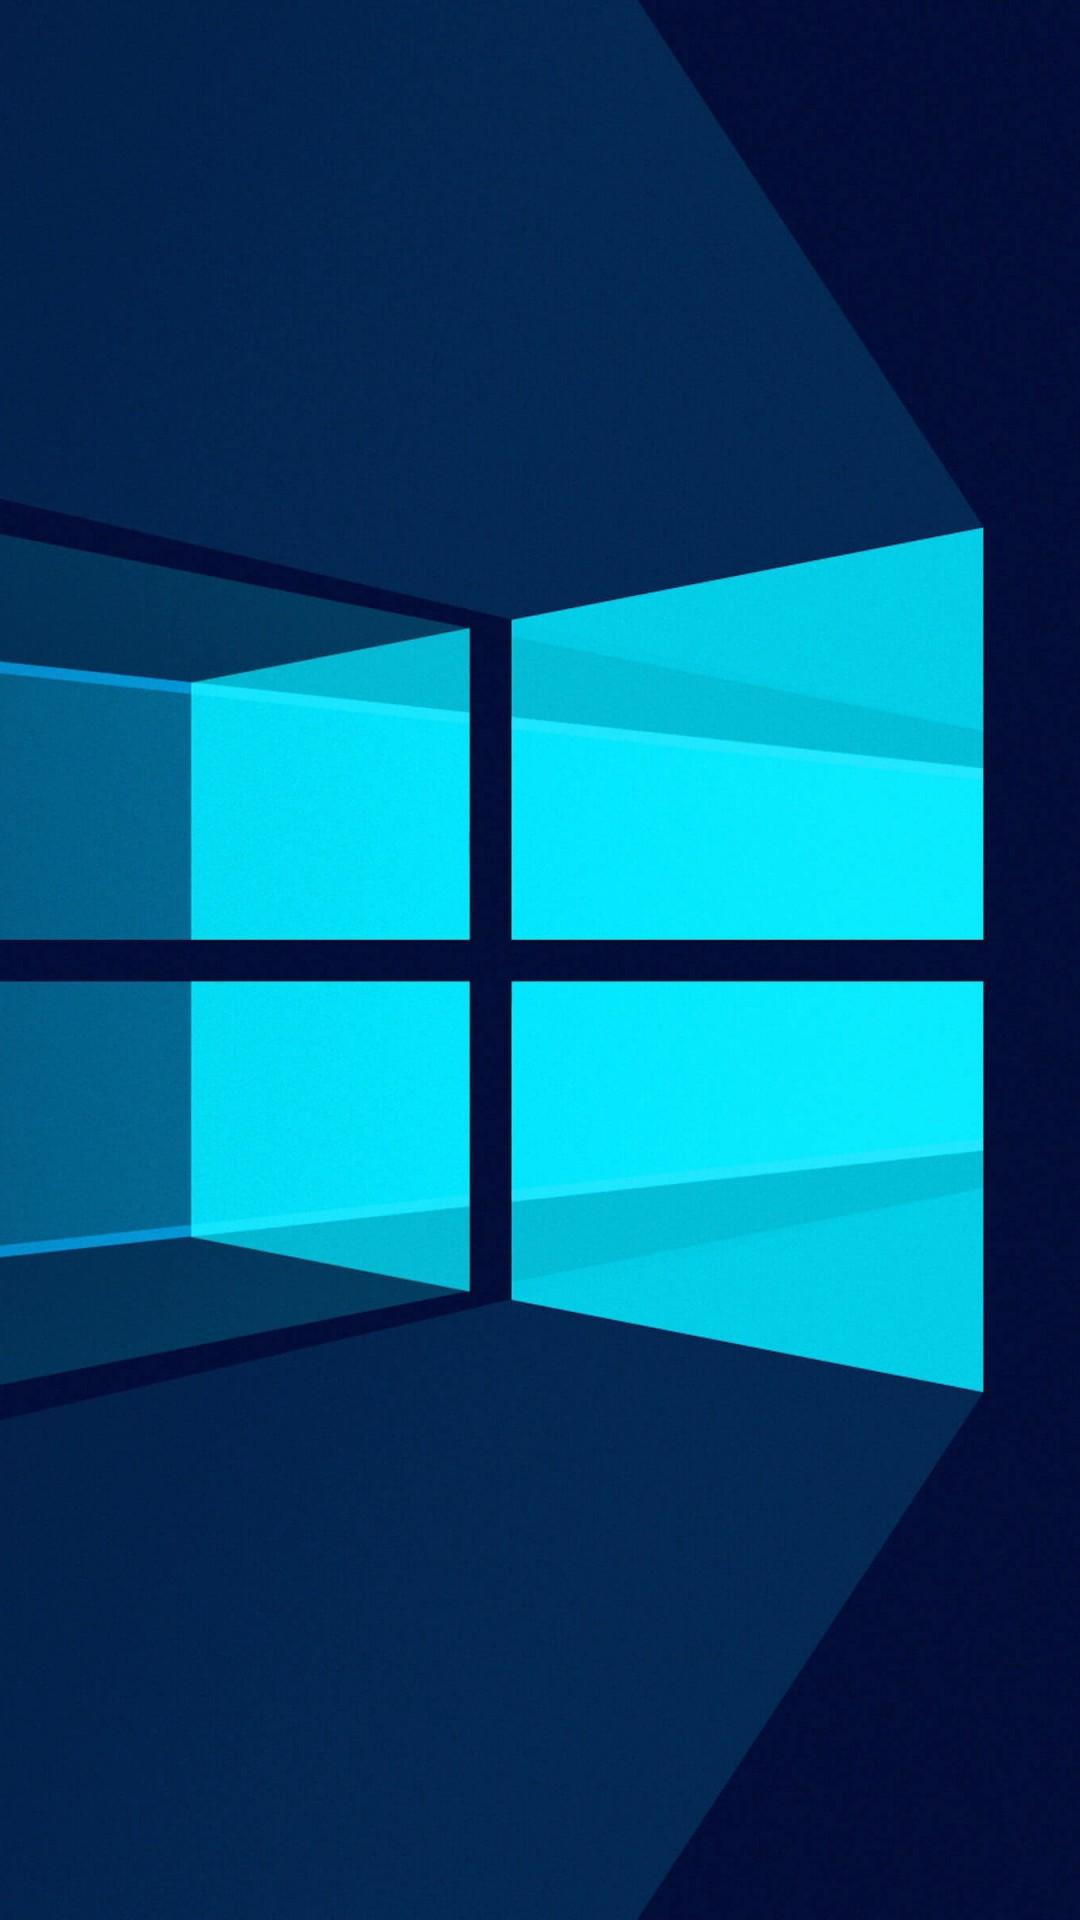 Драйвер sony xperia z1 для windows 10